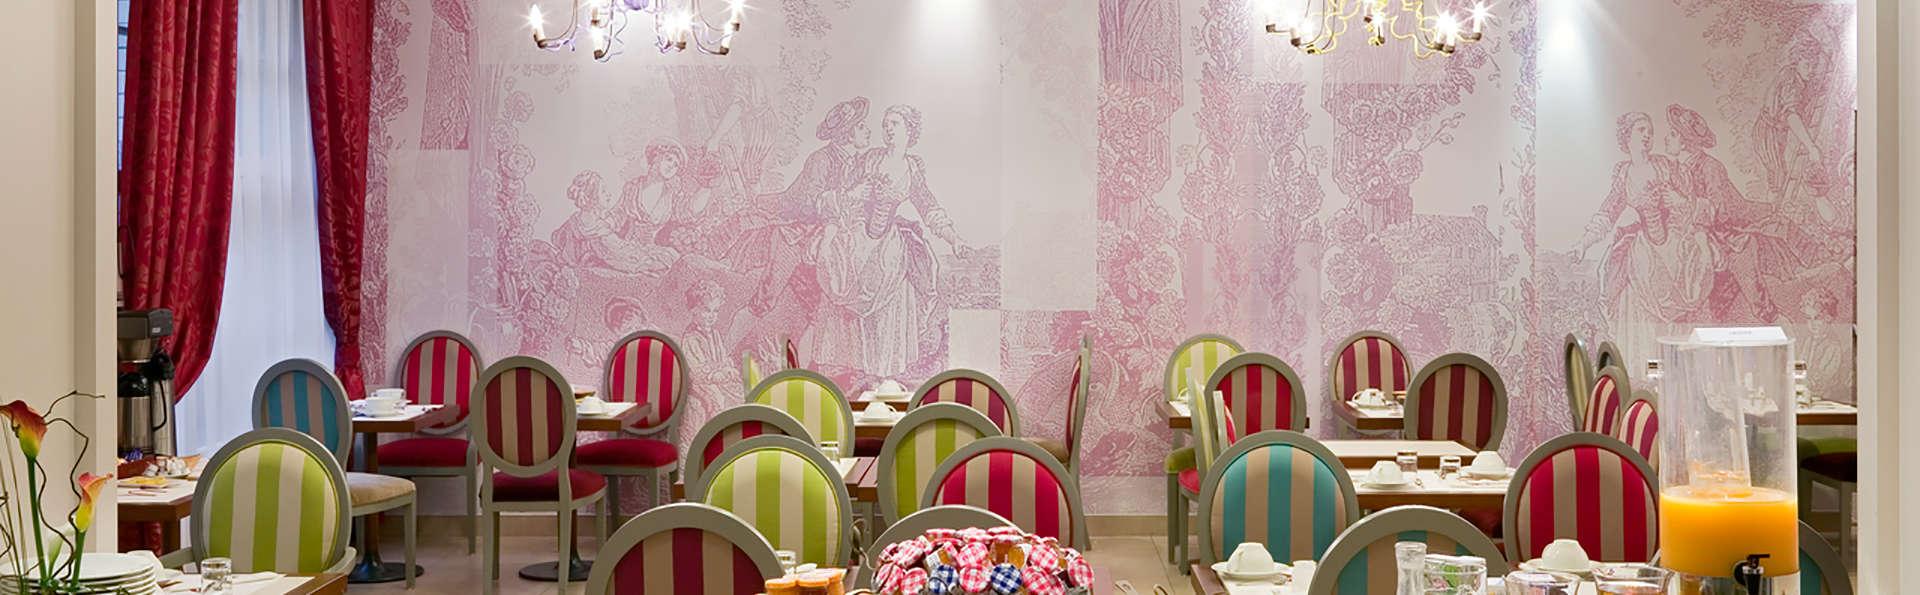 Mercure Relays du Château Rambouillet - EDIT_buffet.jpg